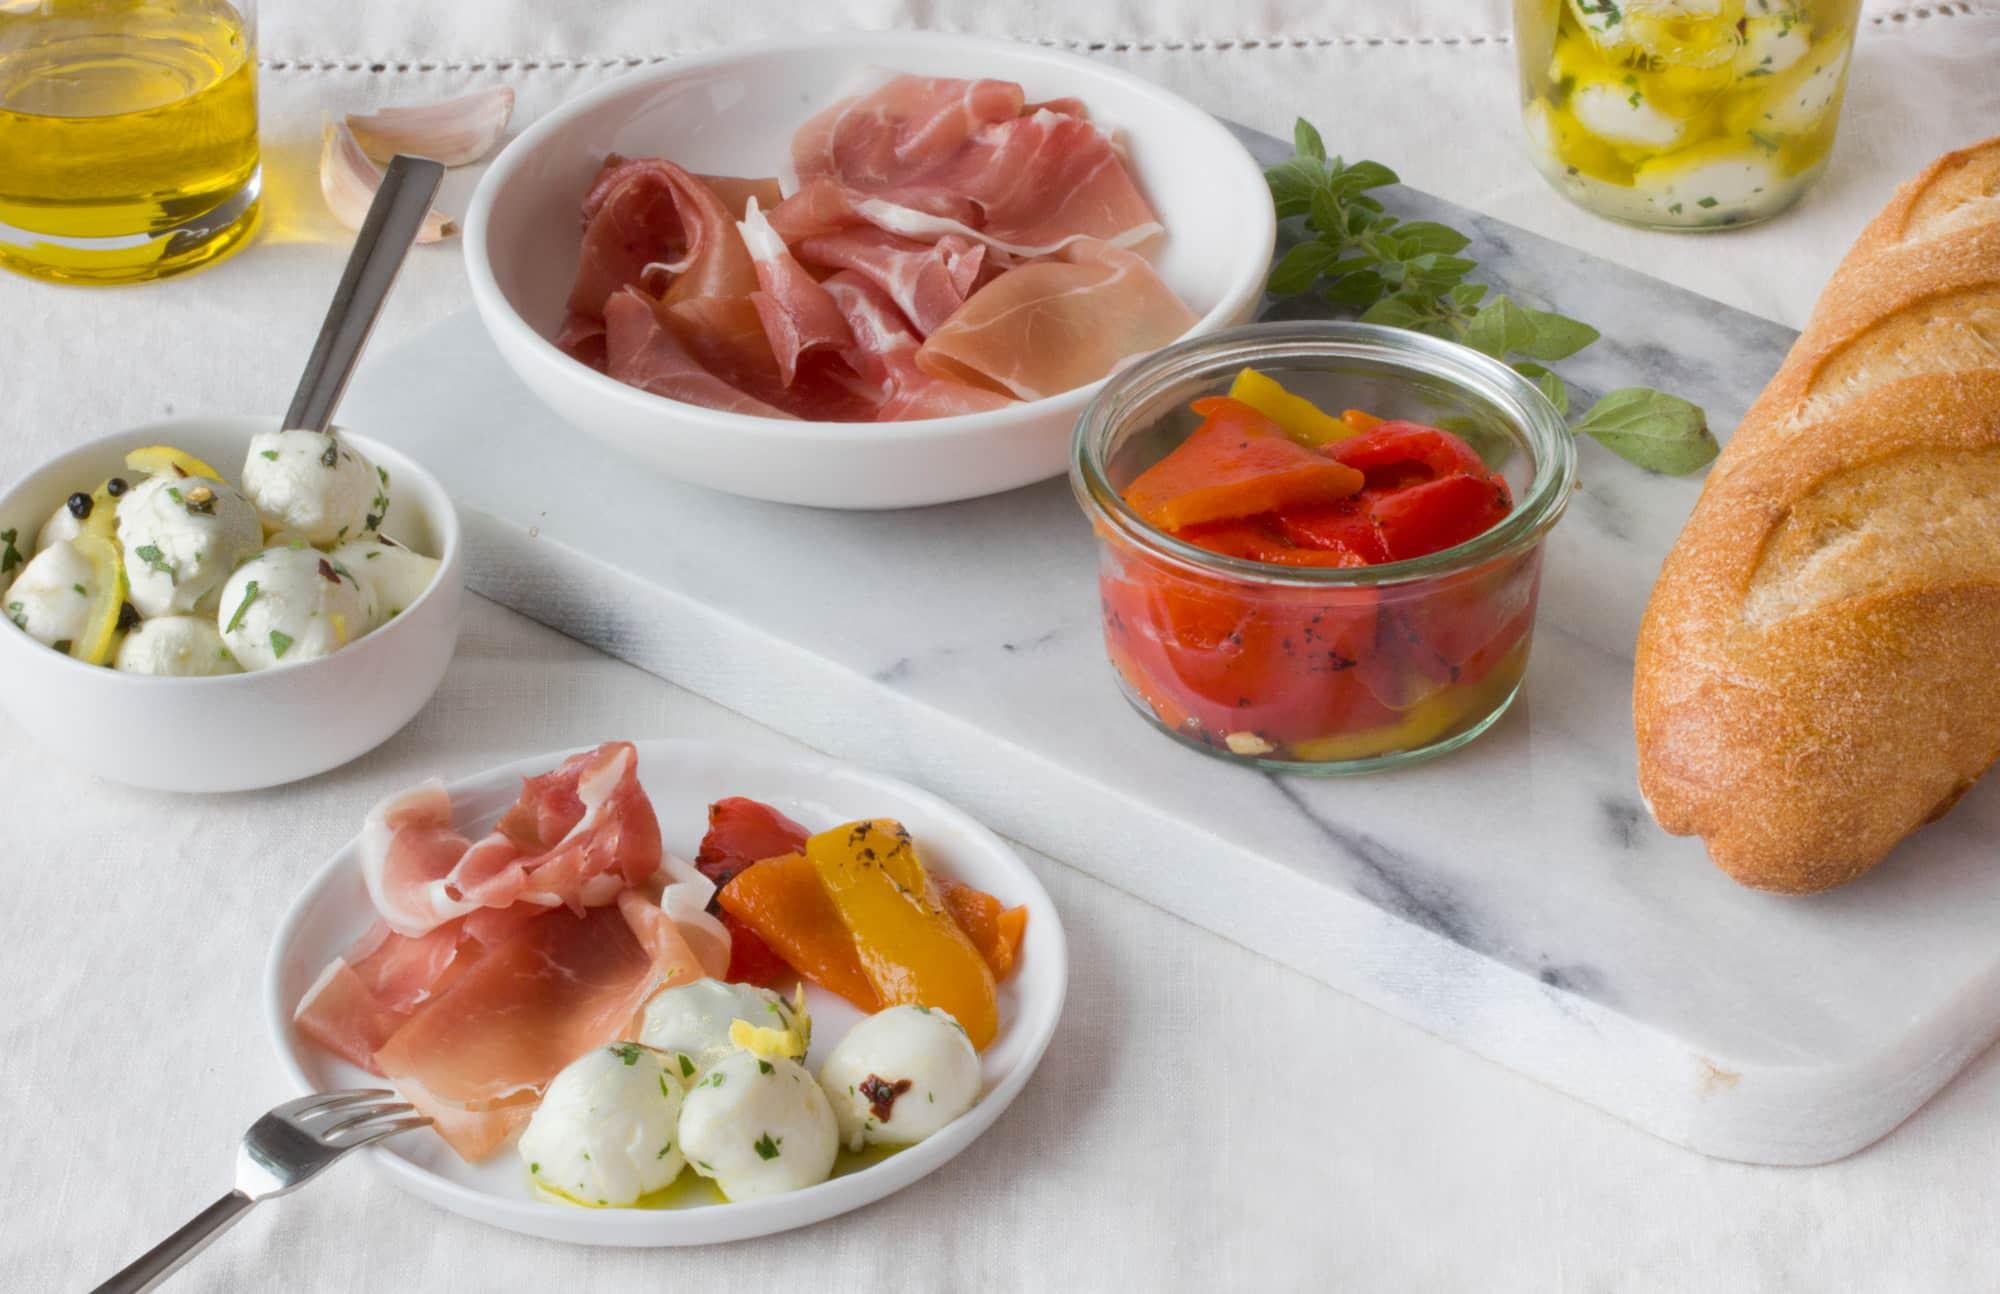 Easy Appetizer Recipe: Garlic and Herb Marinated Mozzarella